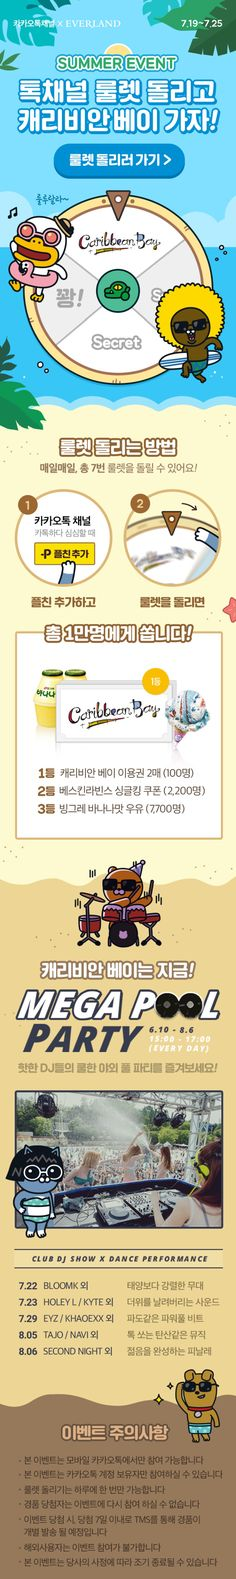 Event Landing Page, Event Page, Event Design, App Design, Dm Poster, Korea Design, Cosmetic Design, Promotional Design, Mini Games